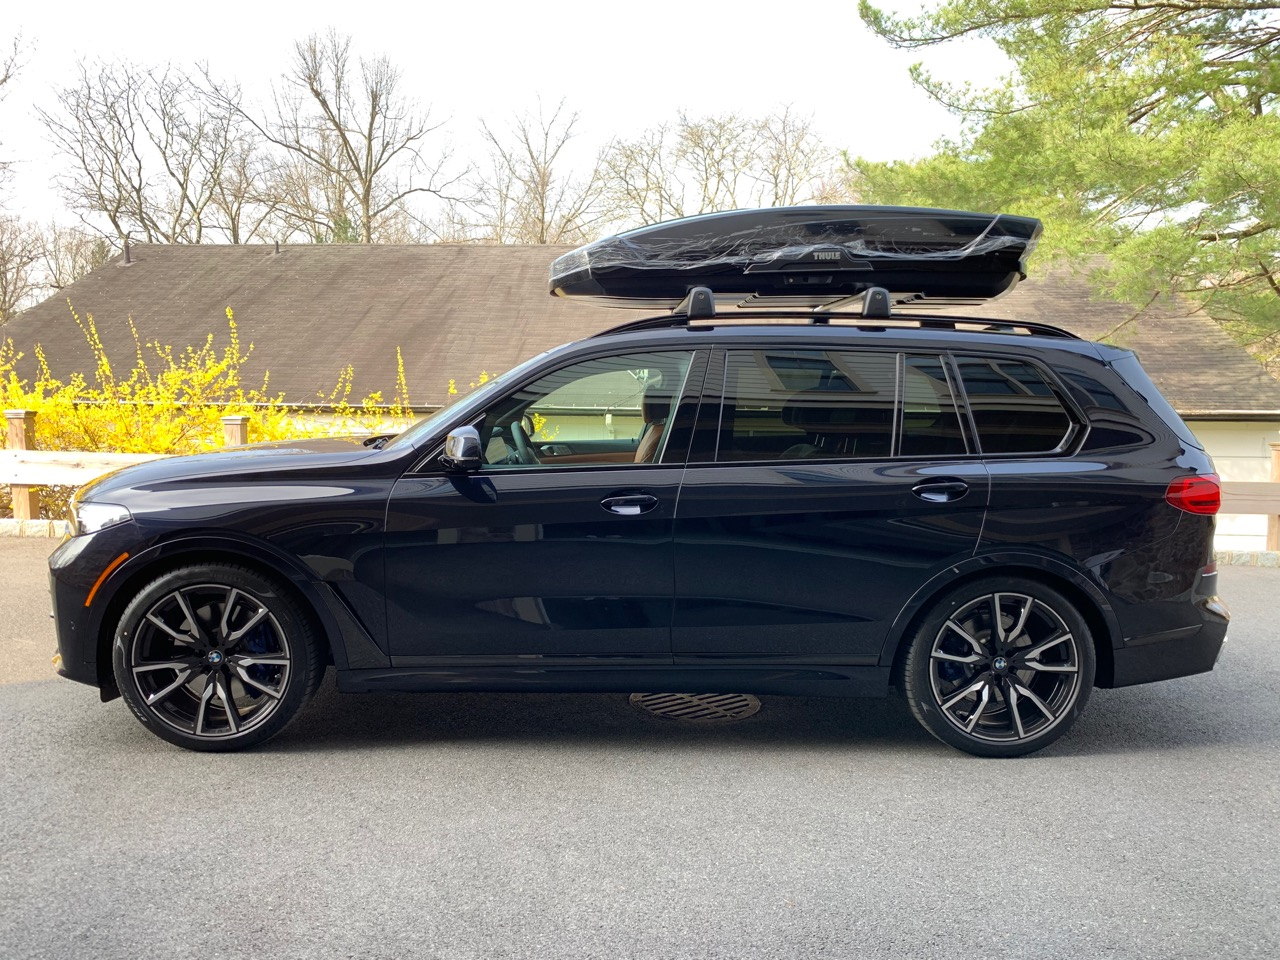 Thule roof rack, cool car gadgets